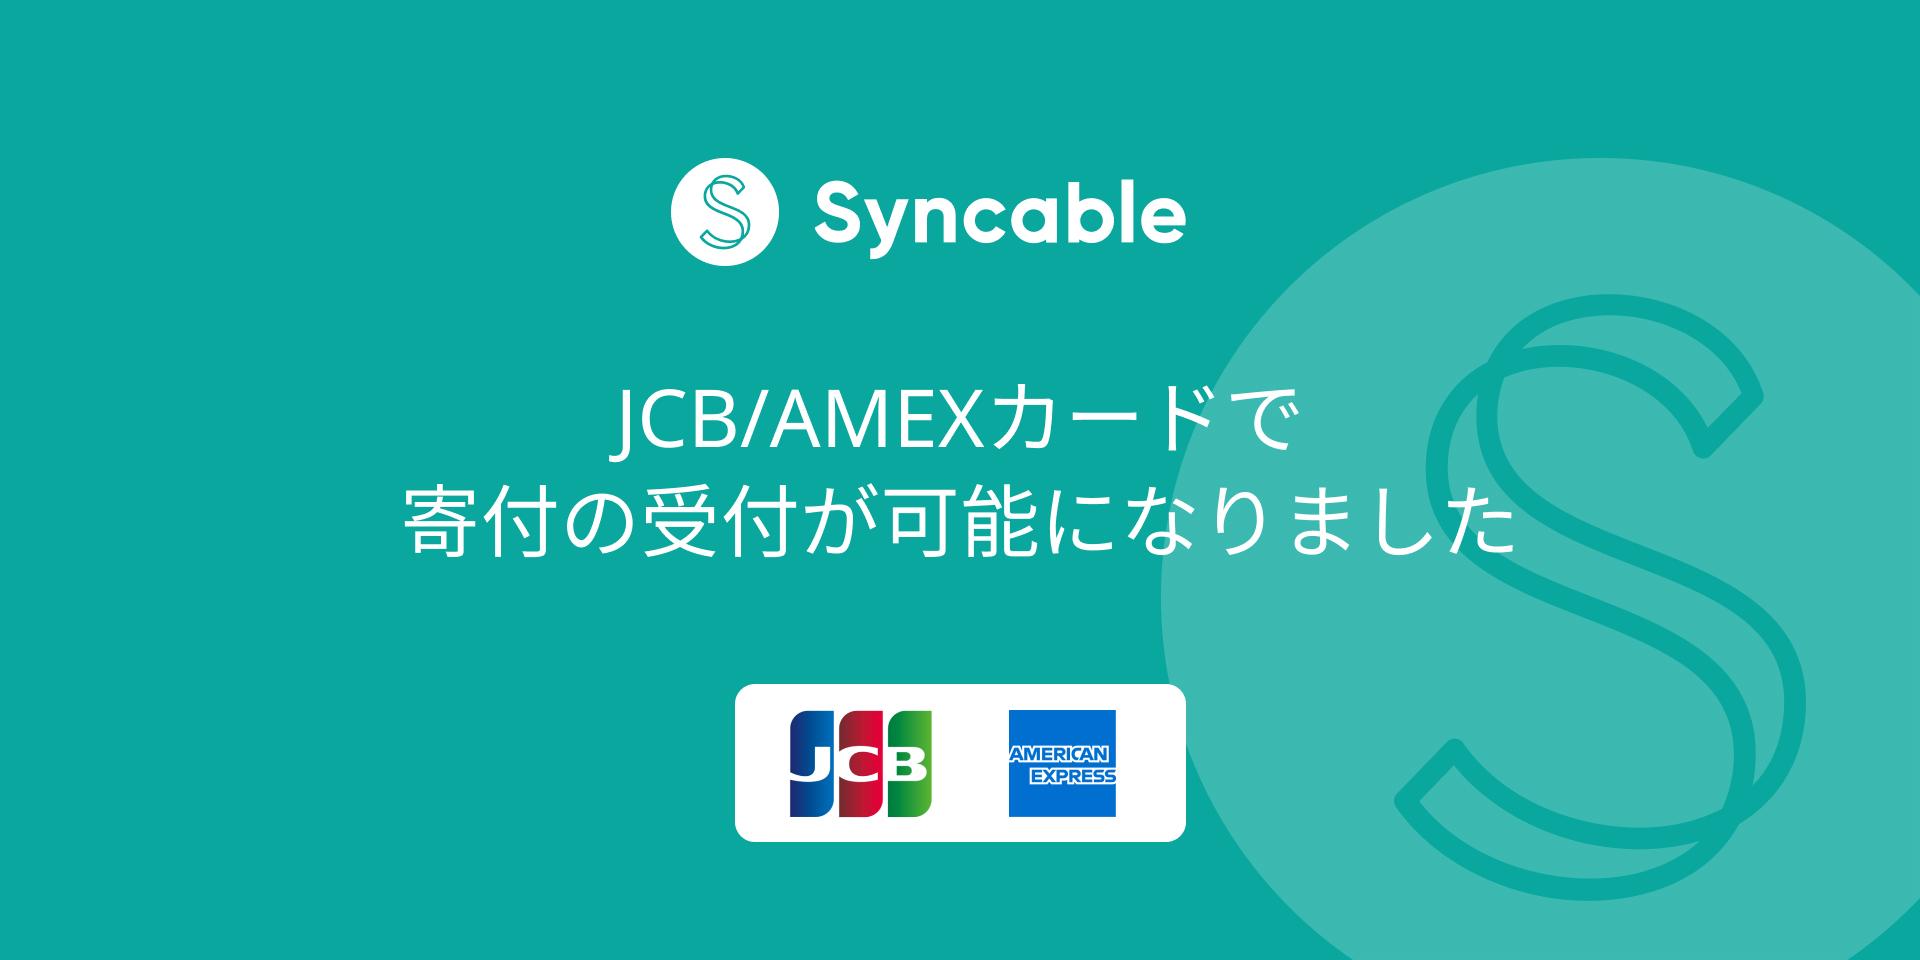 SyncableでJCB、American Expressでの寄付ができるようになりました